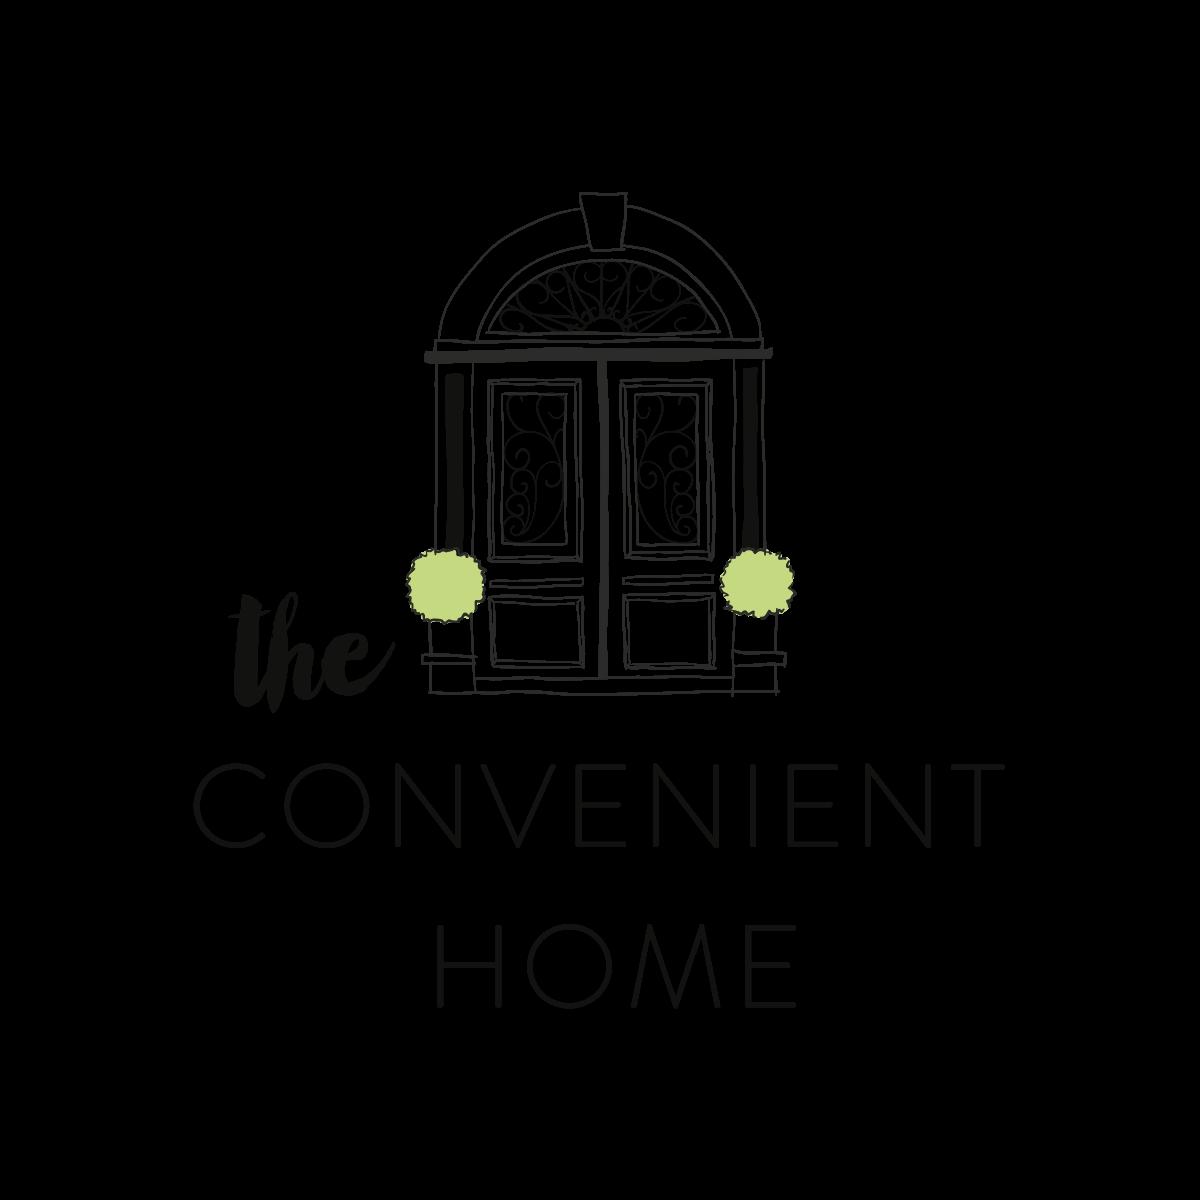 The Convenient Home needs a logo